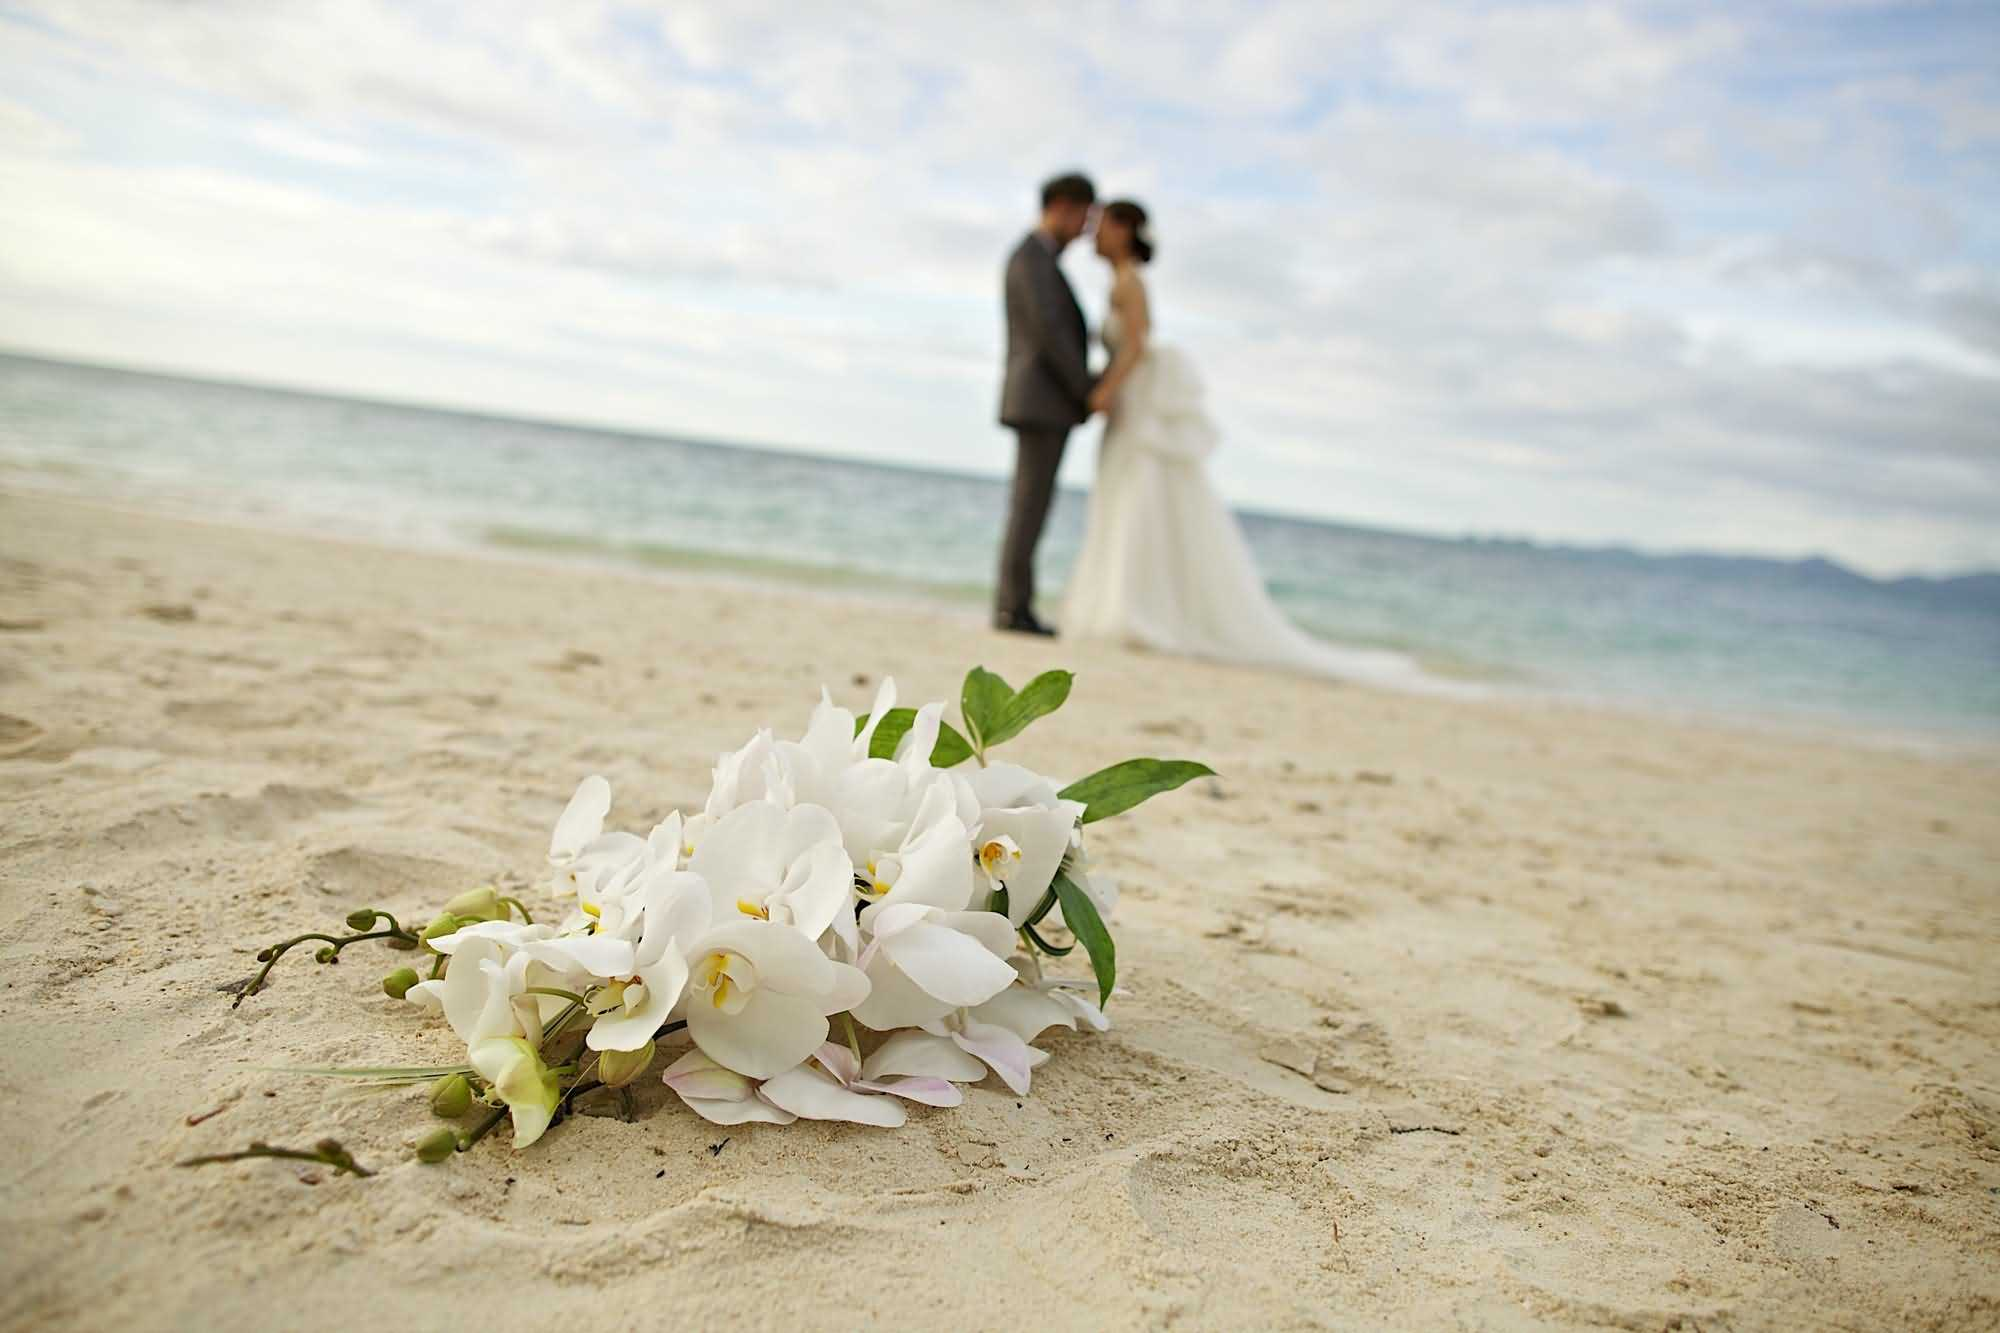 Beach Romantic Wedding Couple Wallpaper